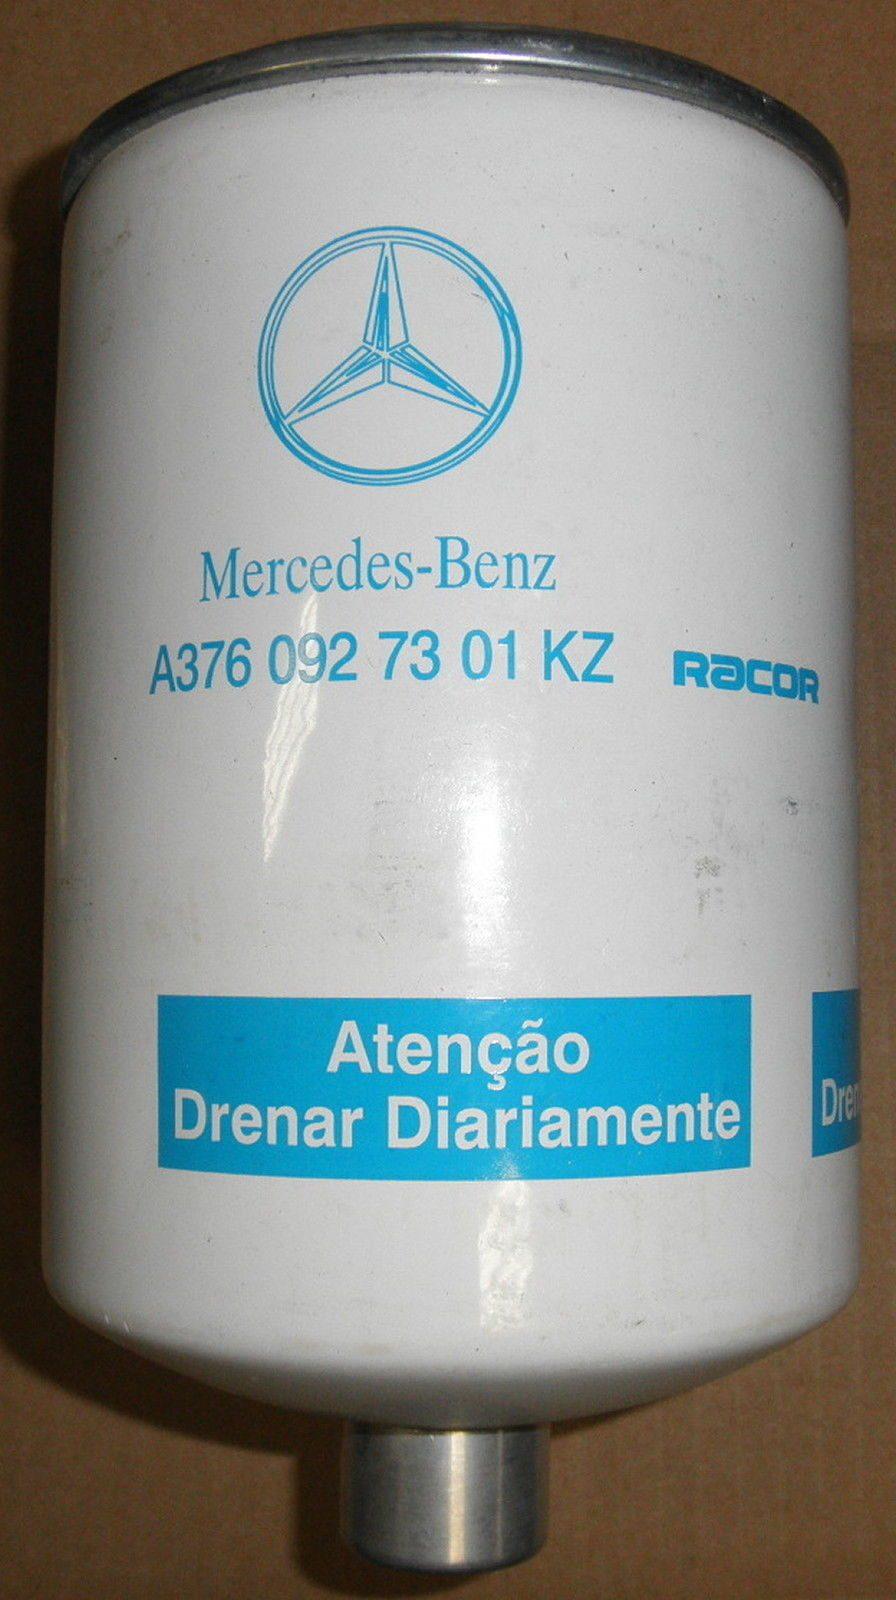 hight resolution of oem mercedes freightliner fuel filter separator a3760927301kz racor f1hz9365 a